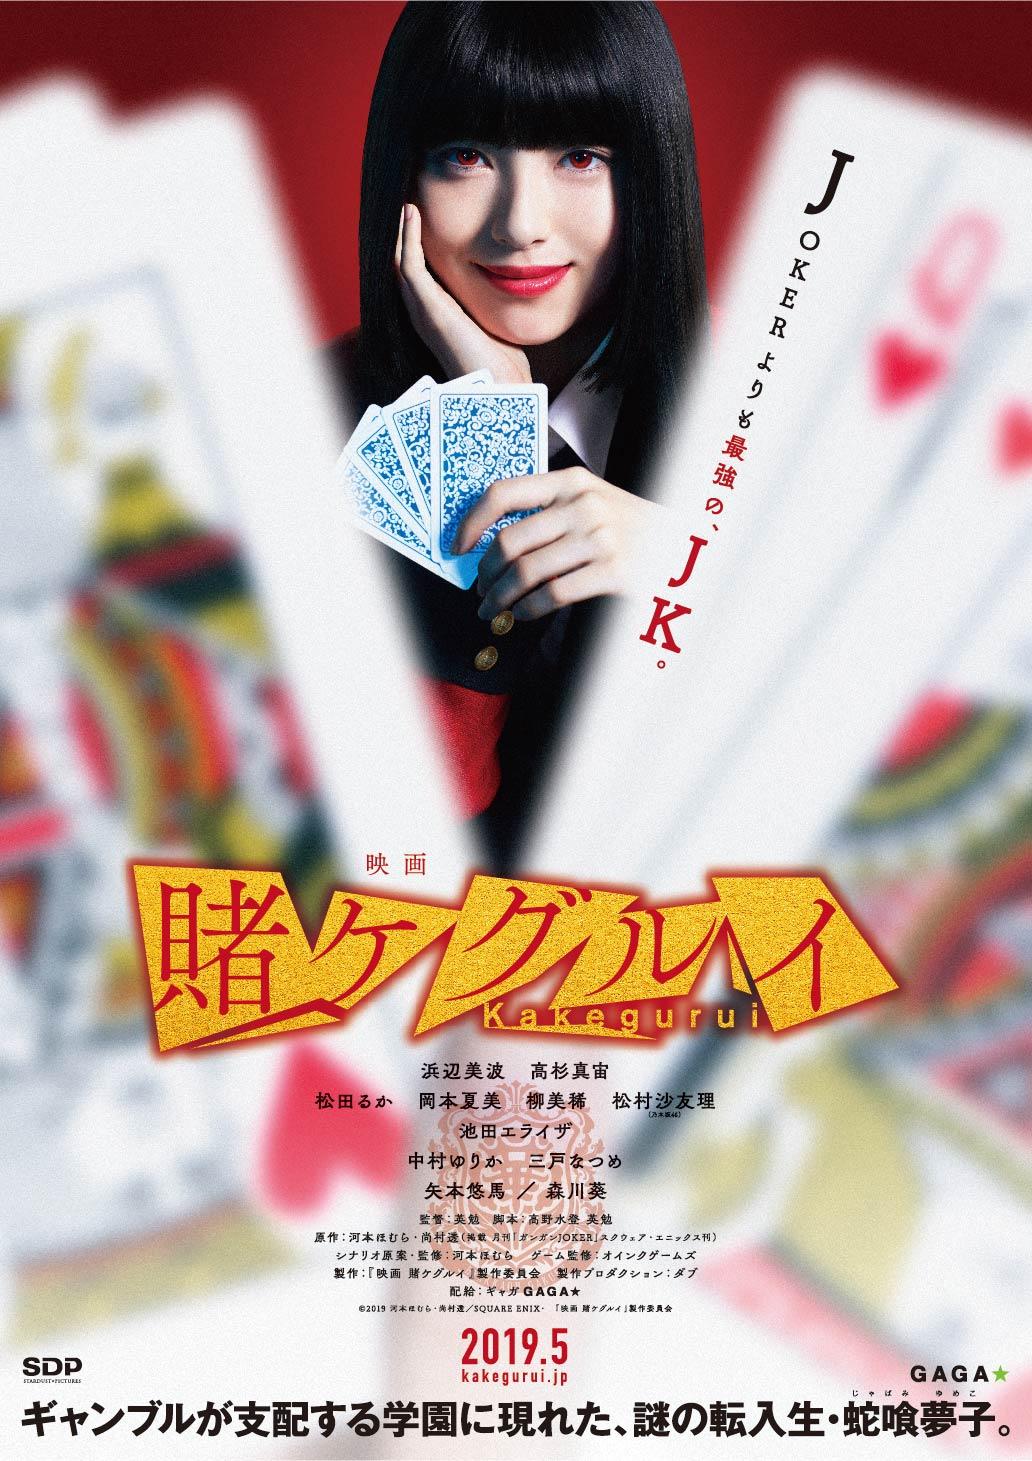 Kakegurui - Compulsive Gambler film movie poster